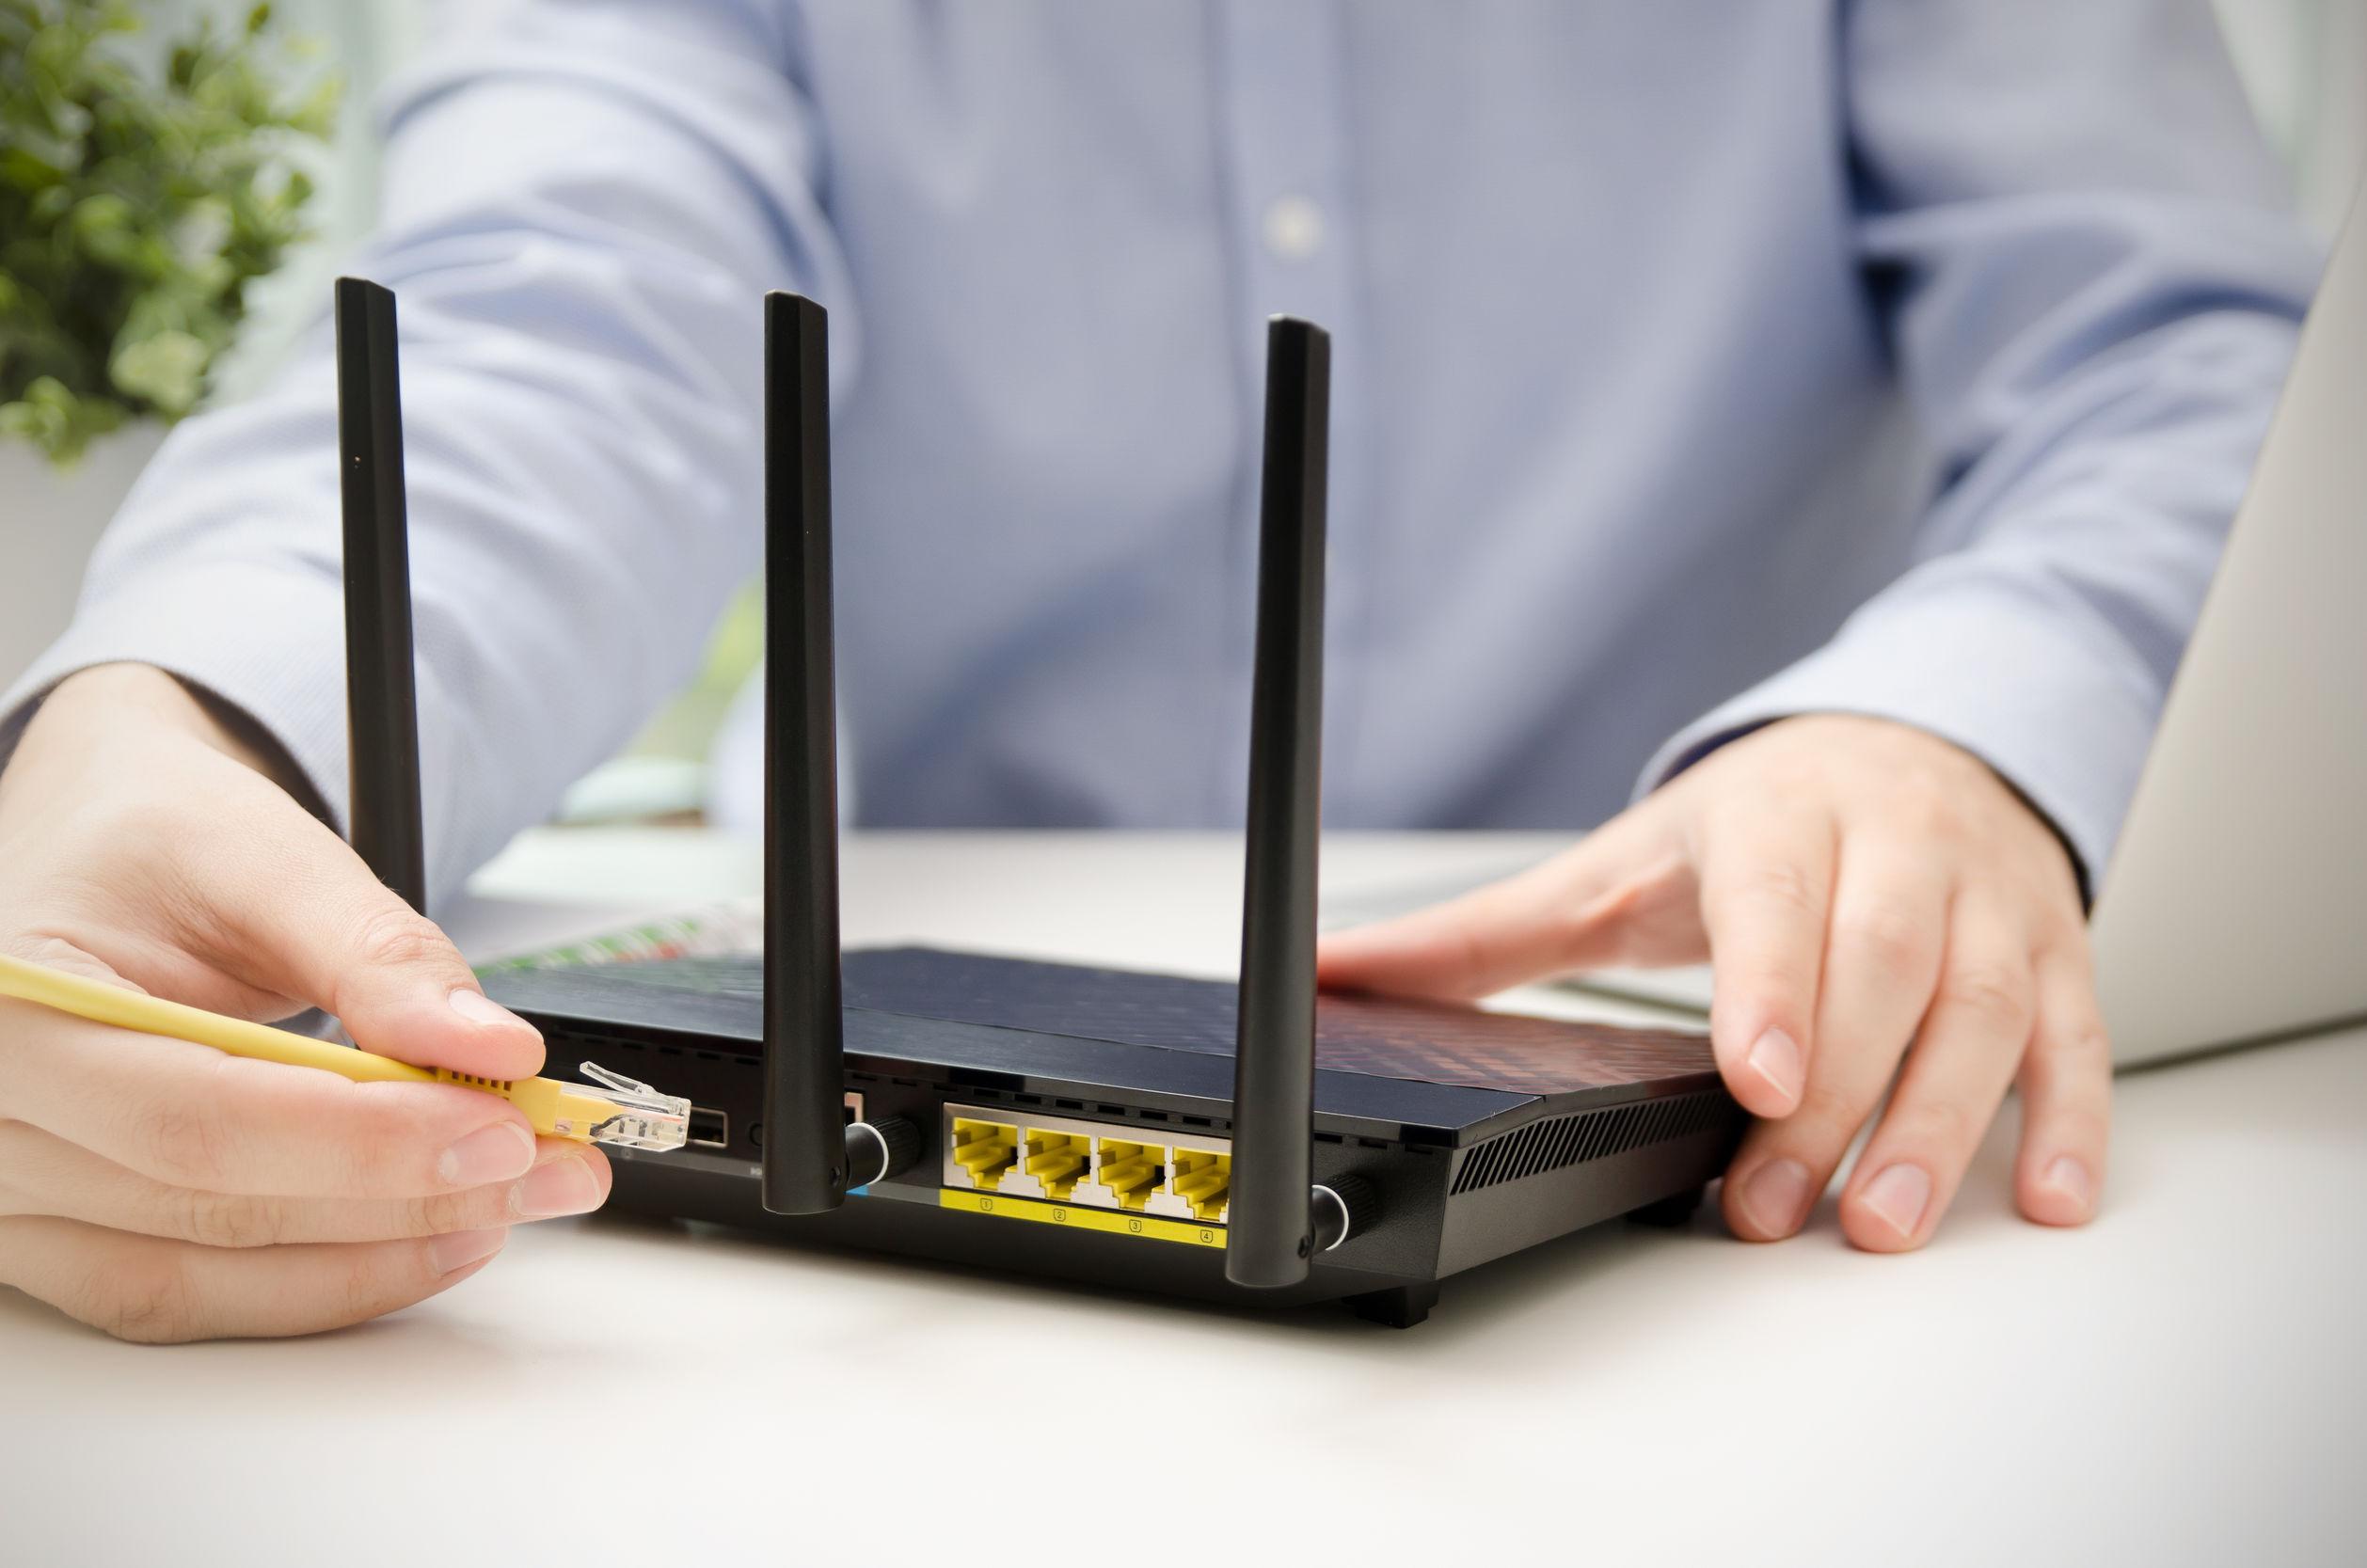 técnico conectando internet